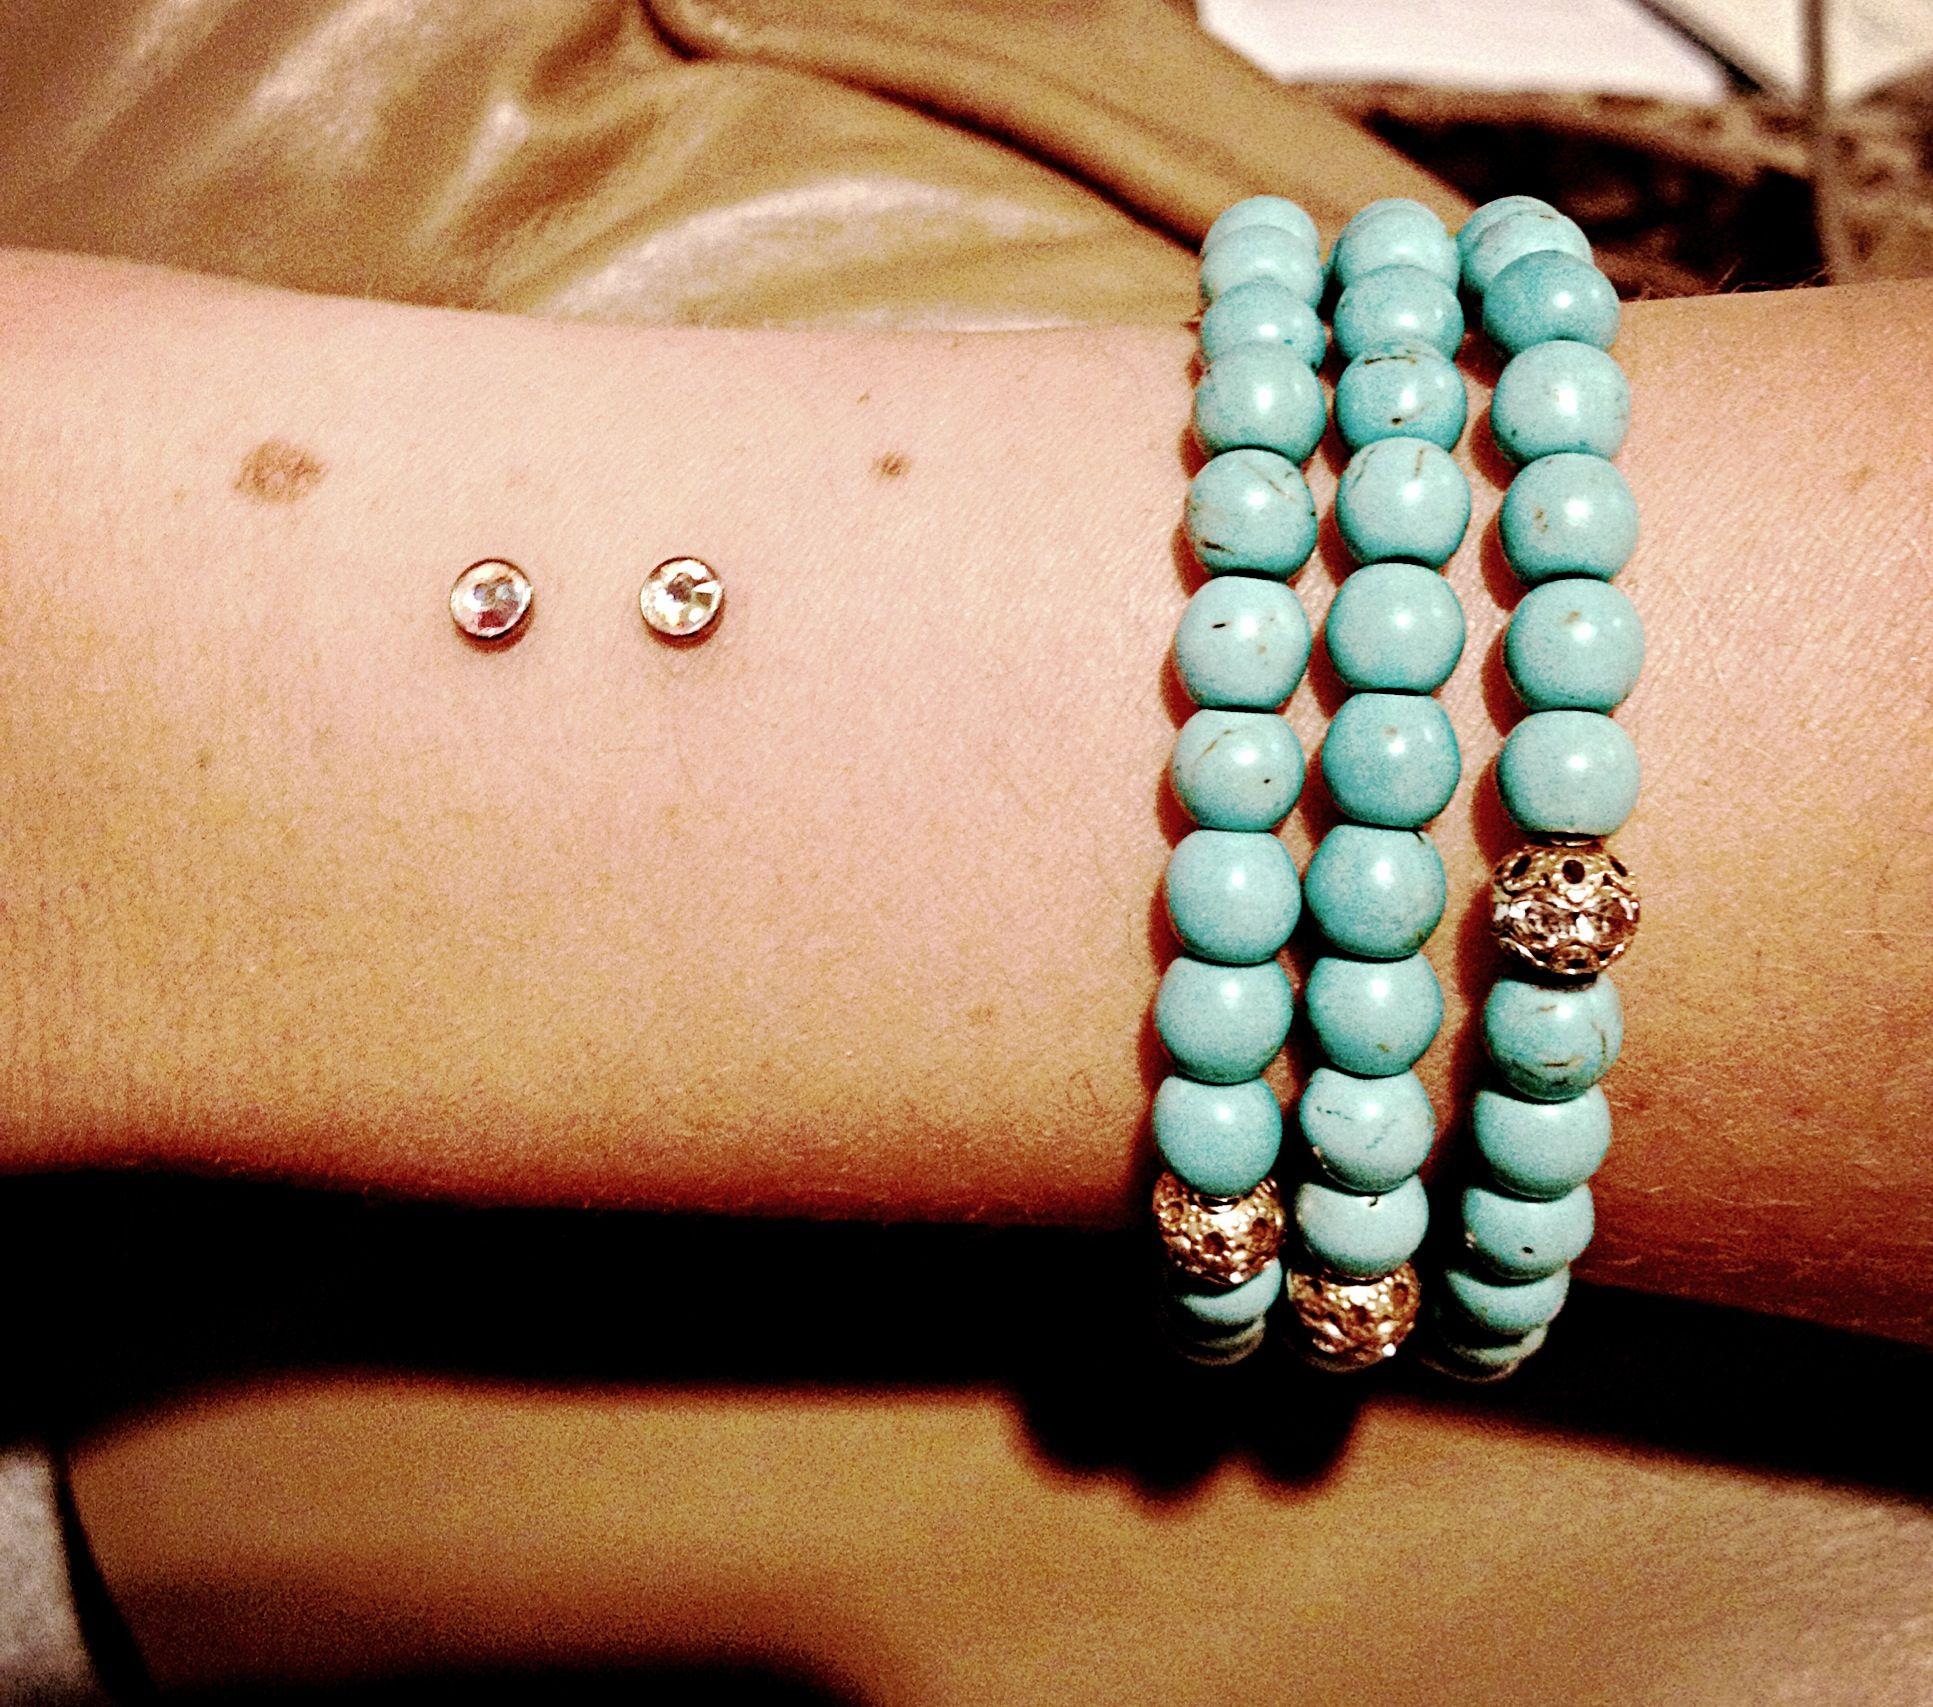 Microdermal piercing ideas  Wrist Dermals   Masa accessory  Pinterest  Piercings